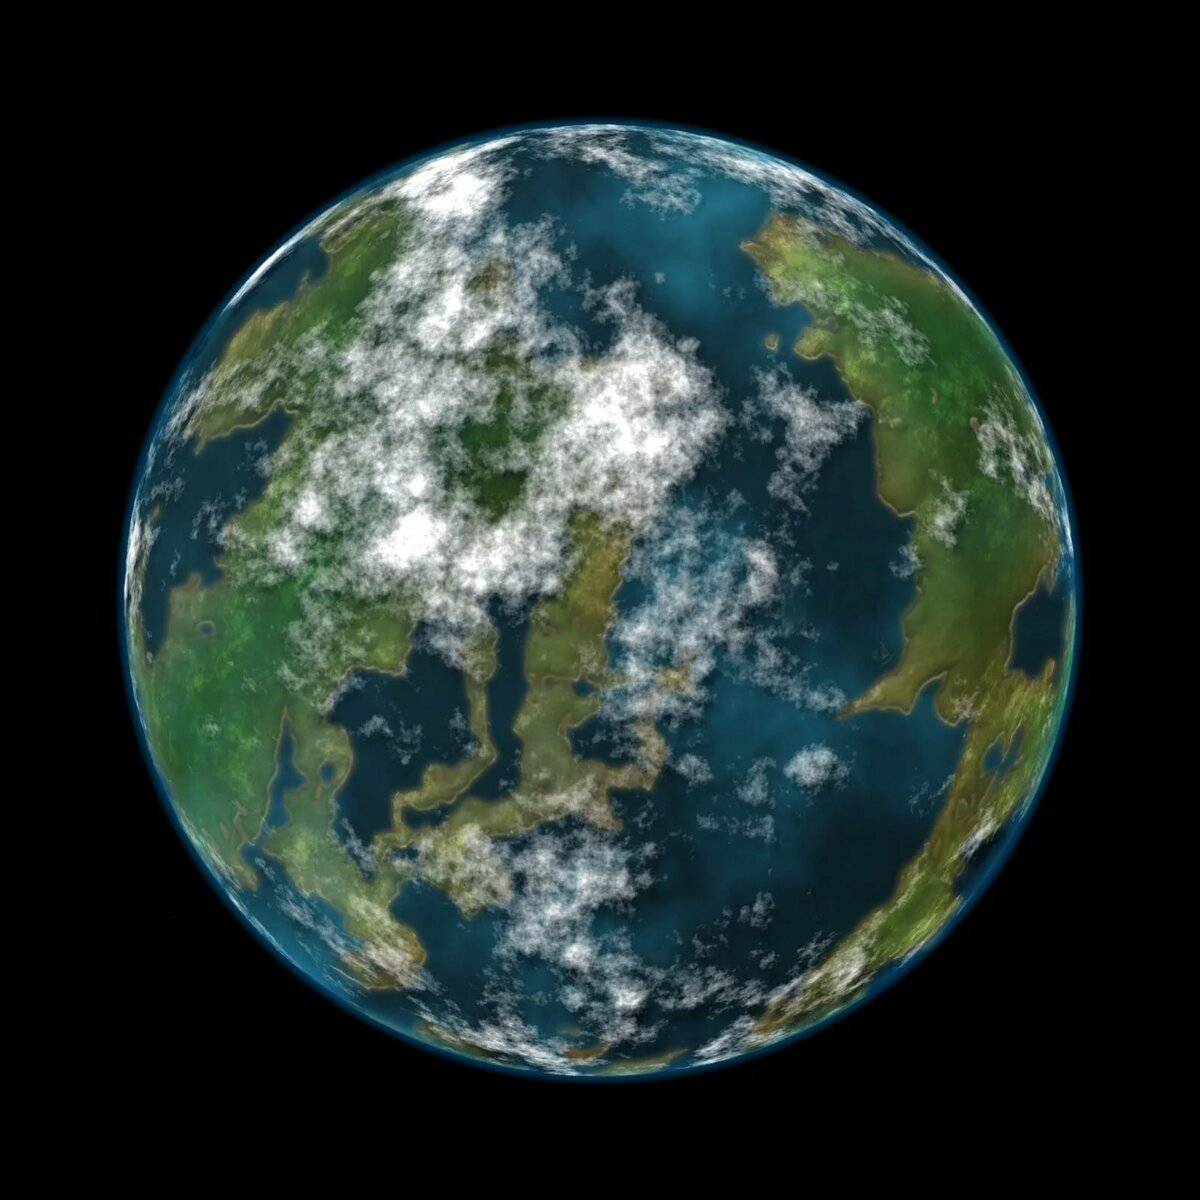 Круглая картинка земли